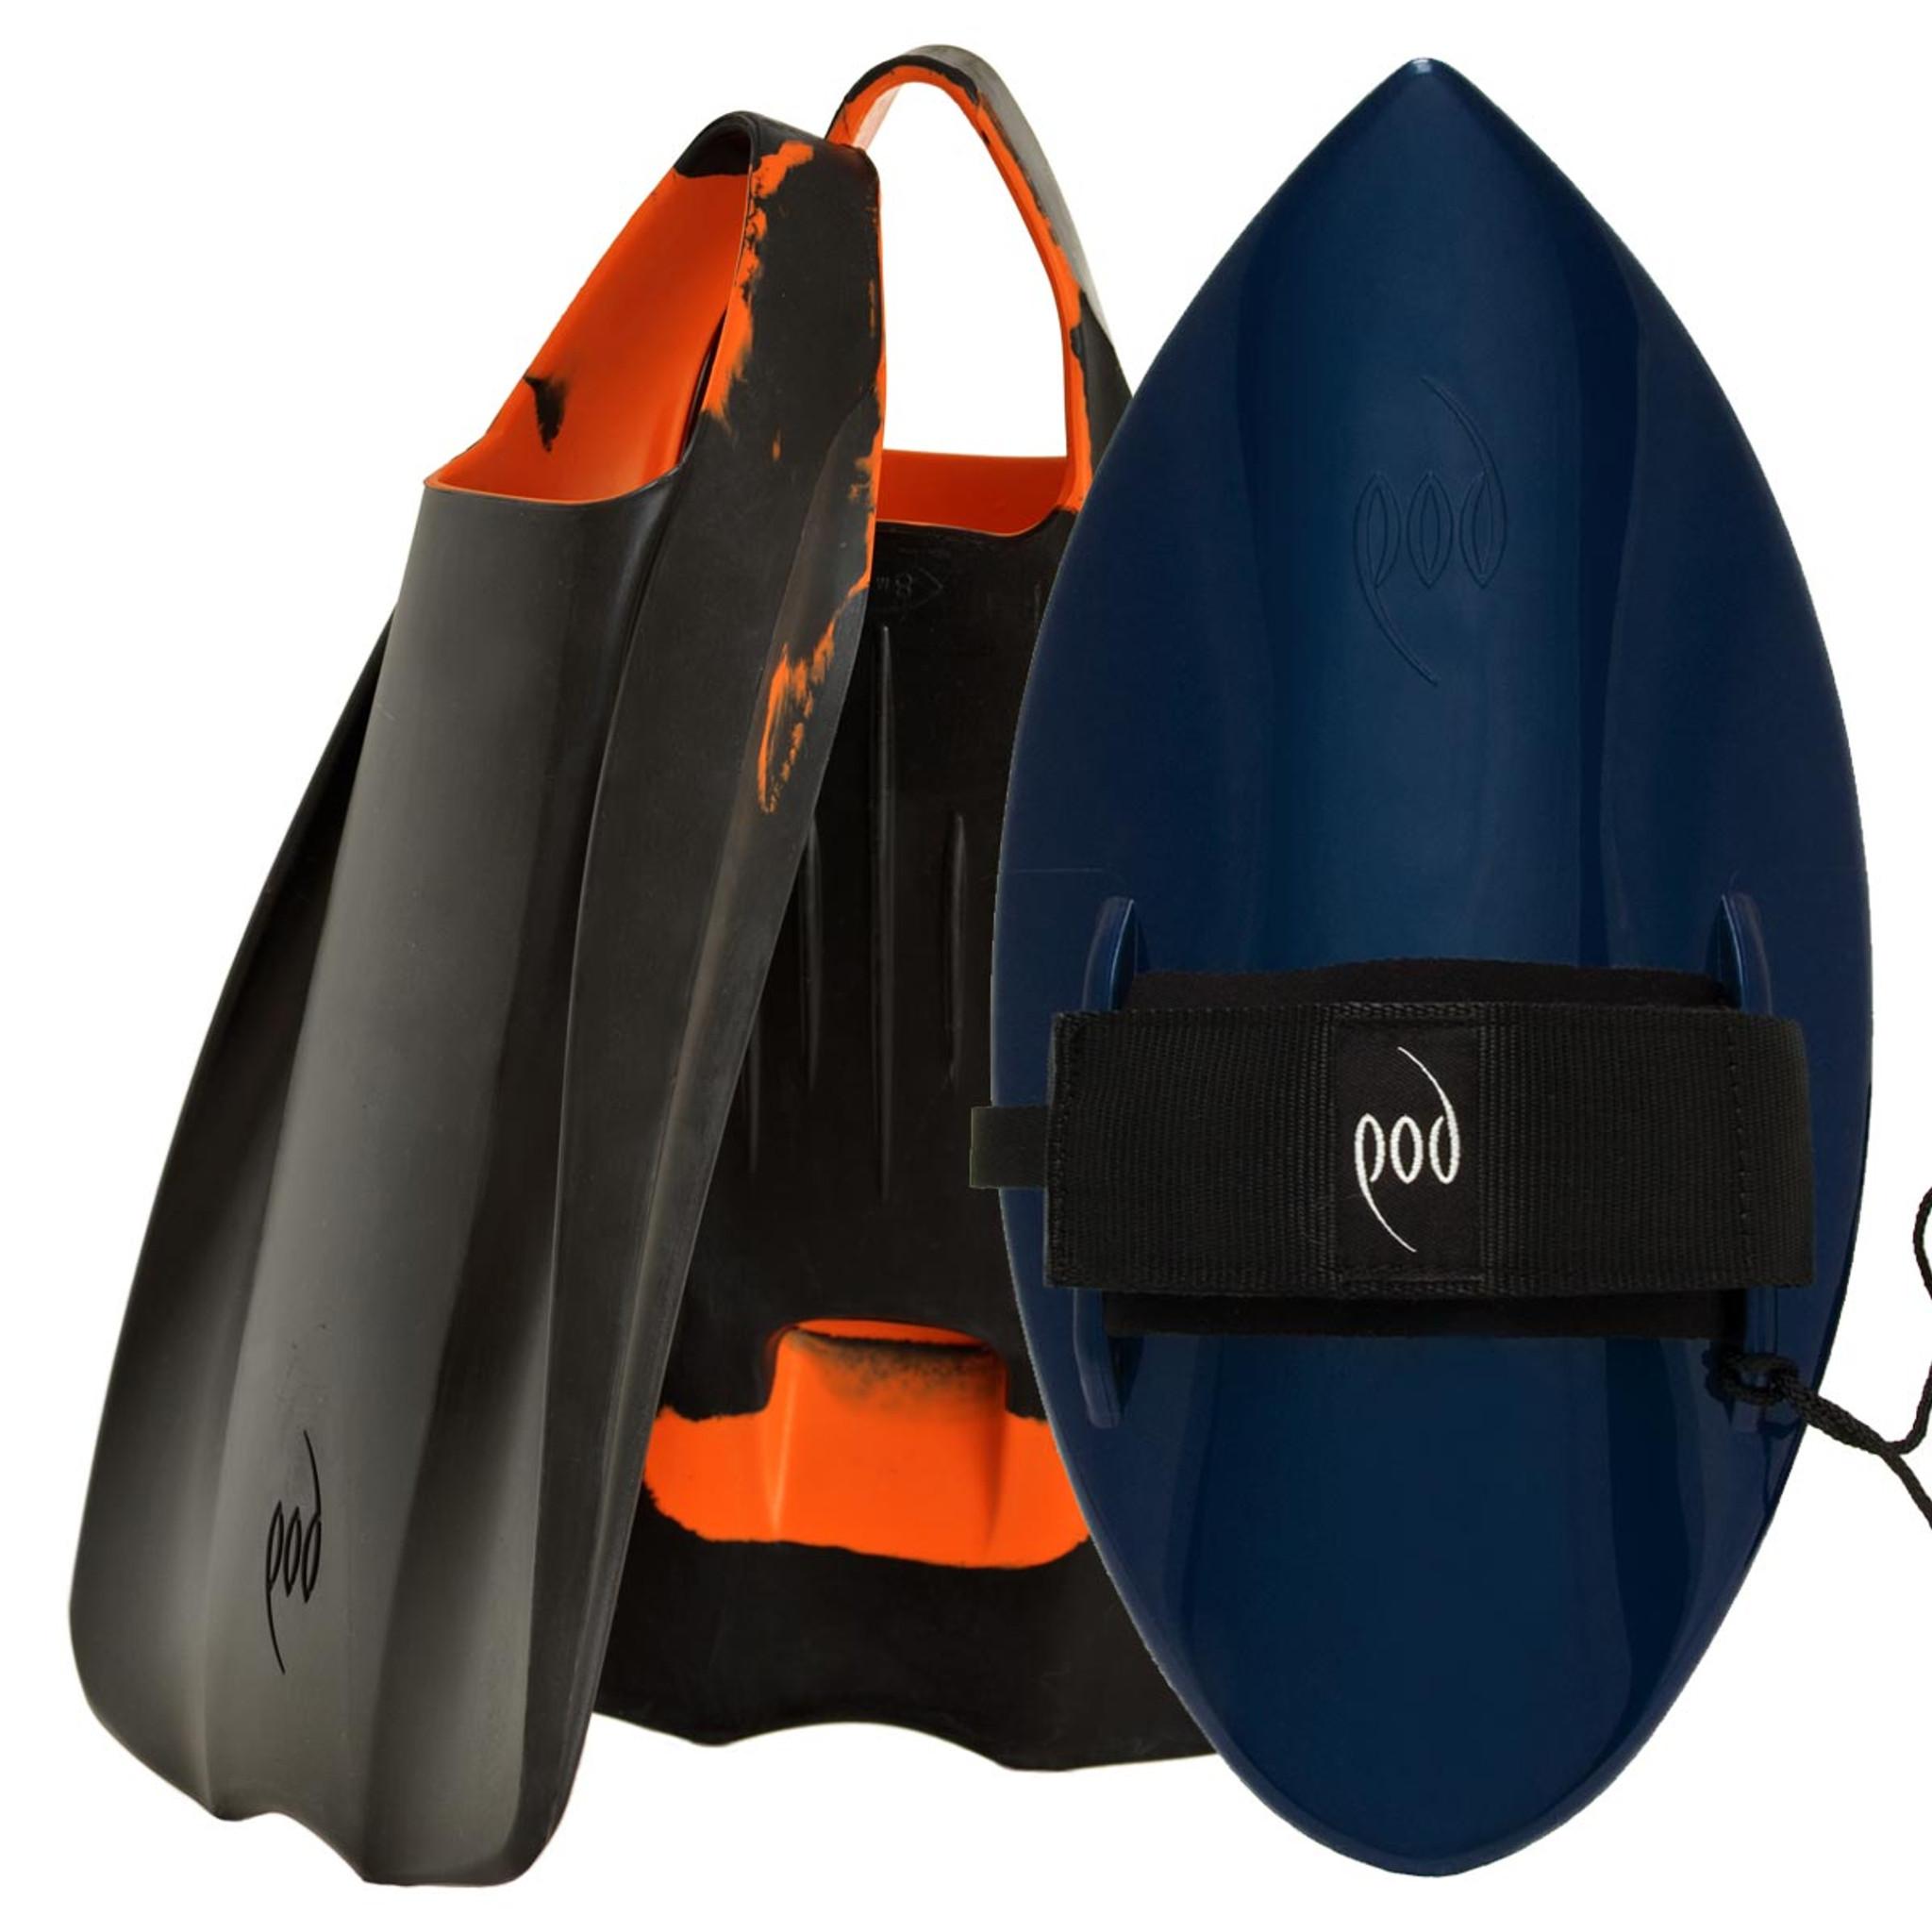 POD Fins PF1s Black/Orange - Black/Blue POD Handboard